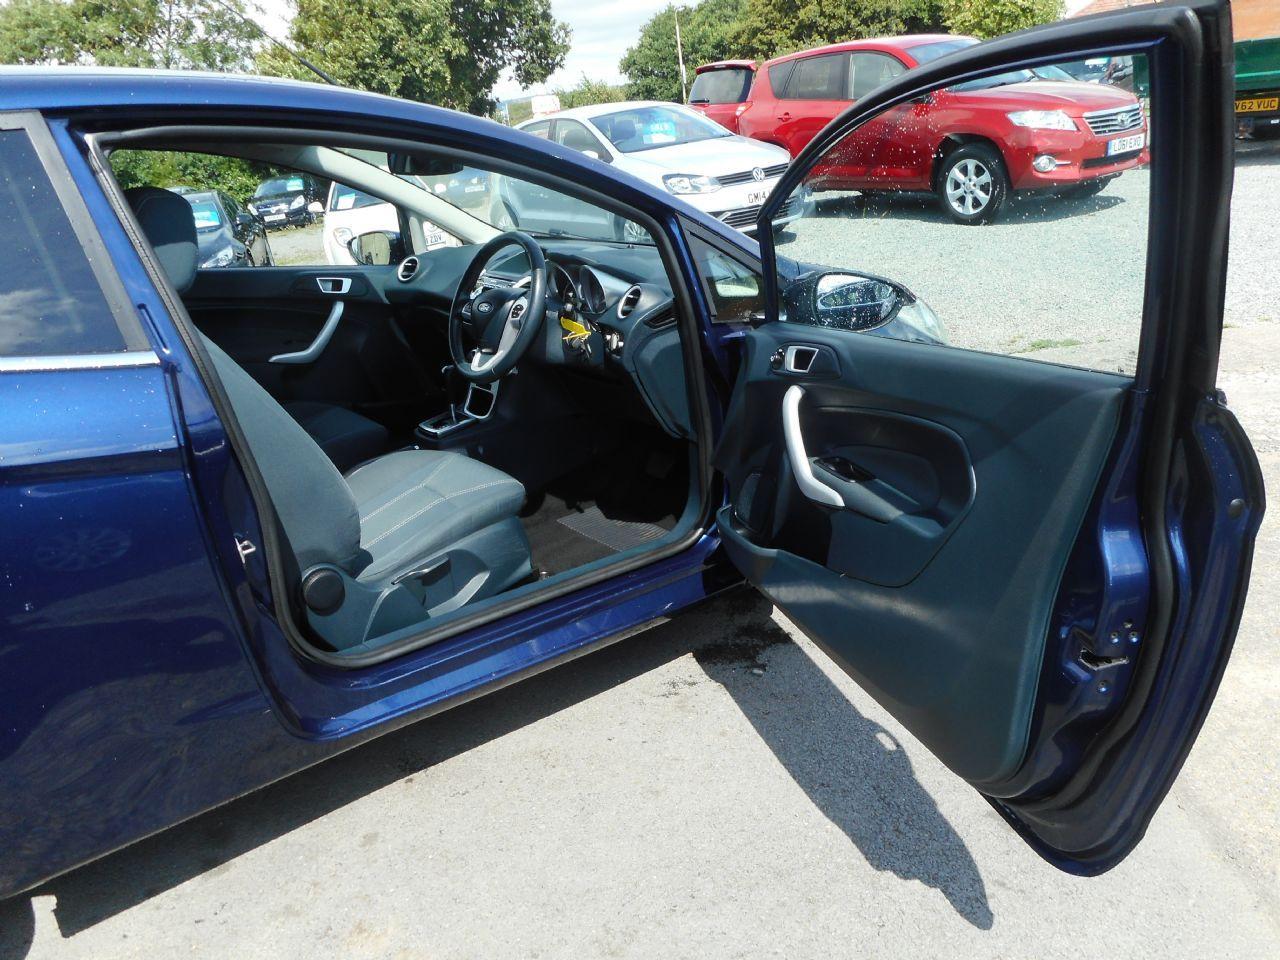 FORD Fiesta Titanium 1.4 096 Auto (2012) - Picture 12